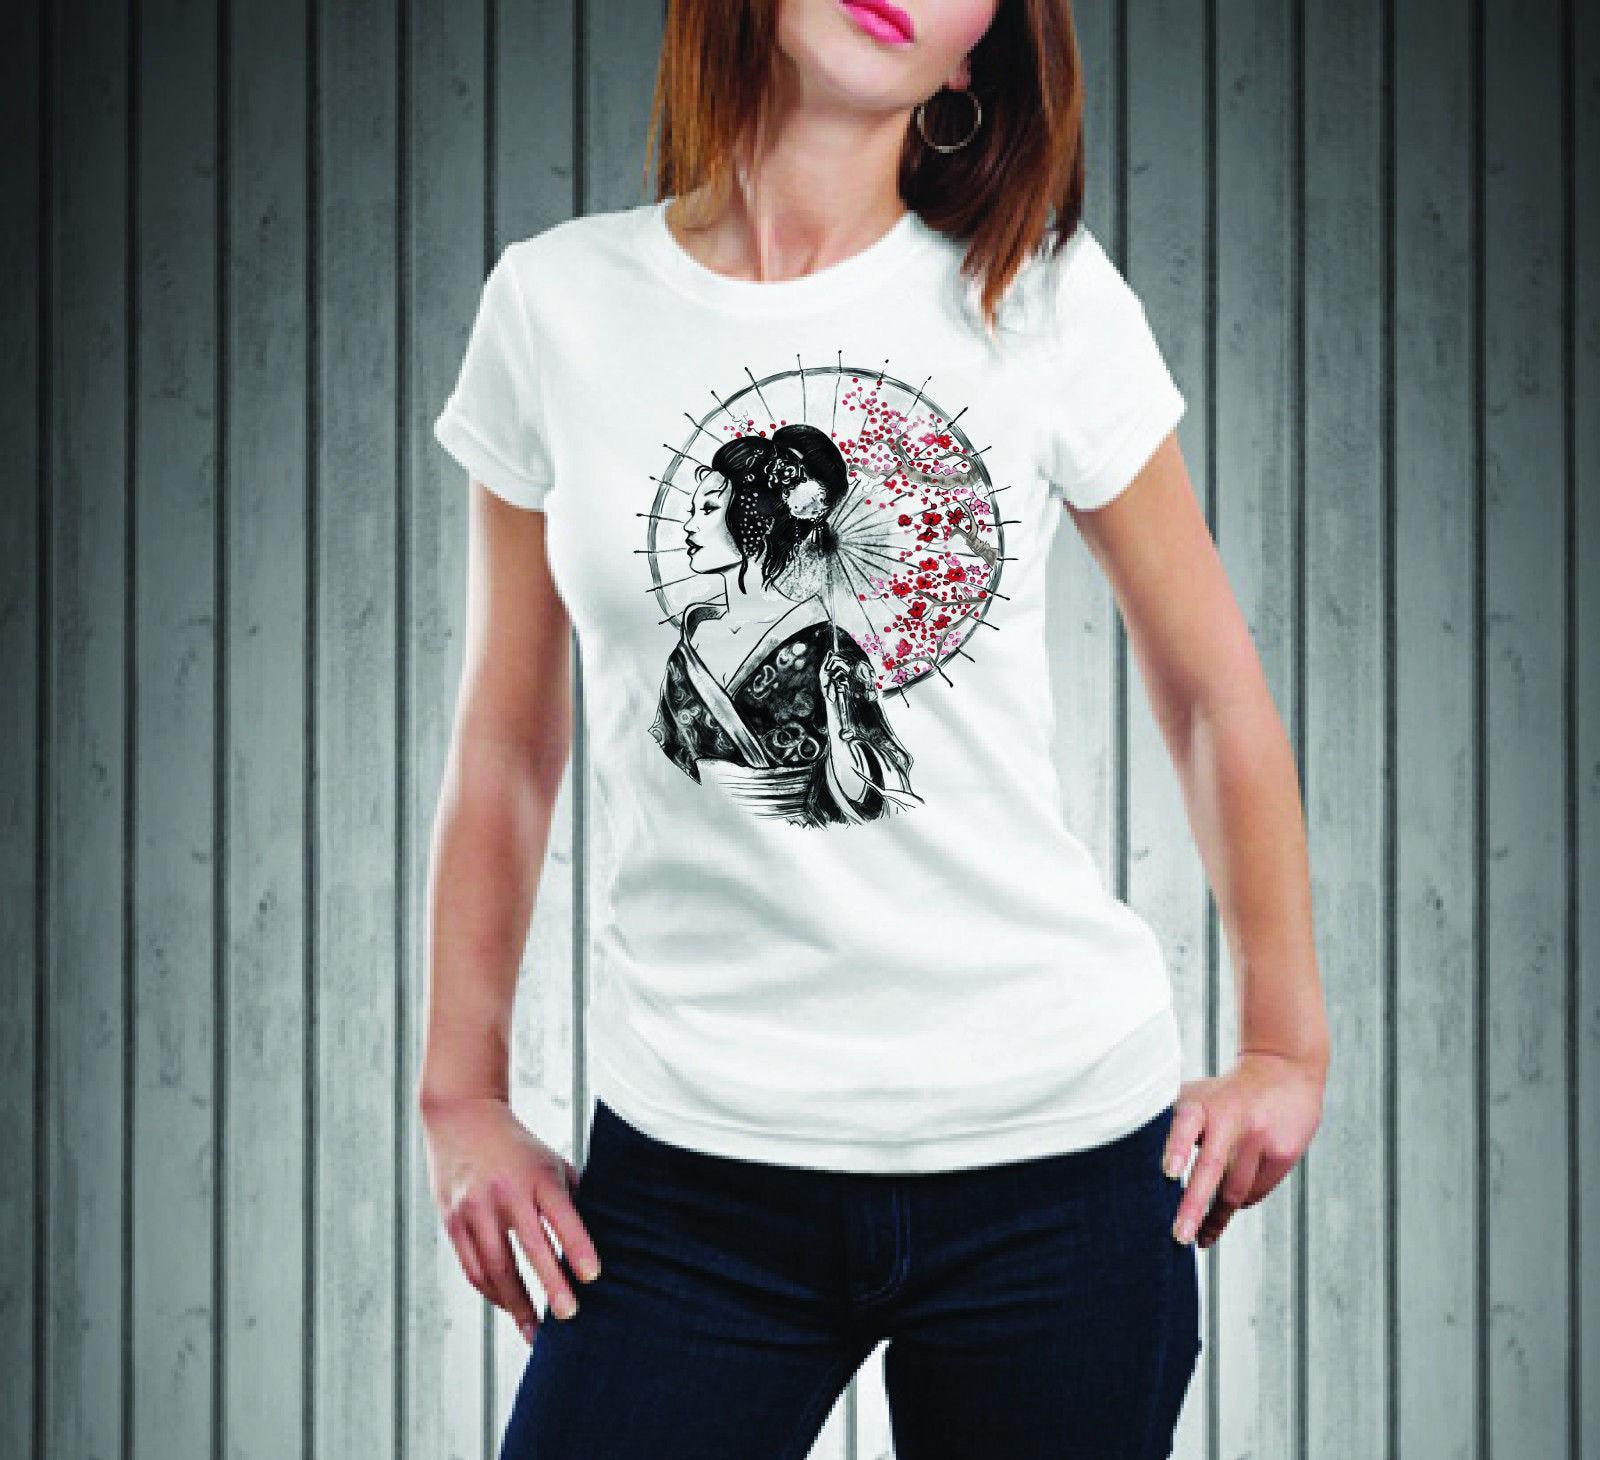 Women'S Tee T Shirt T Shirt Donna Happiness Moda Giappone Geisha T Shirts Short Sleeve Lady Top Shirts 033315